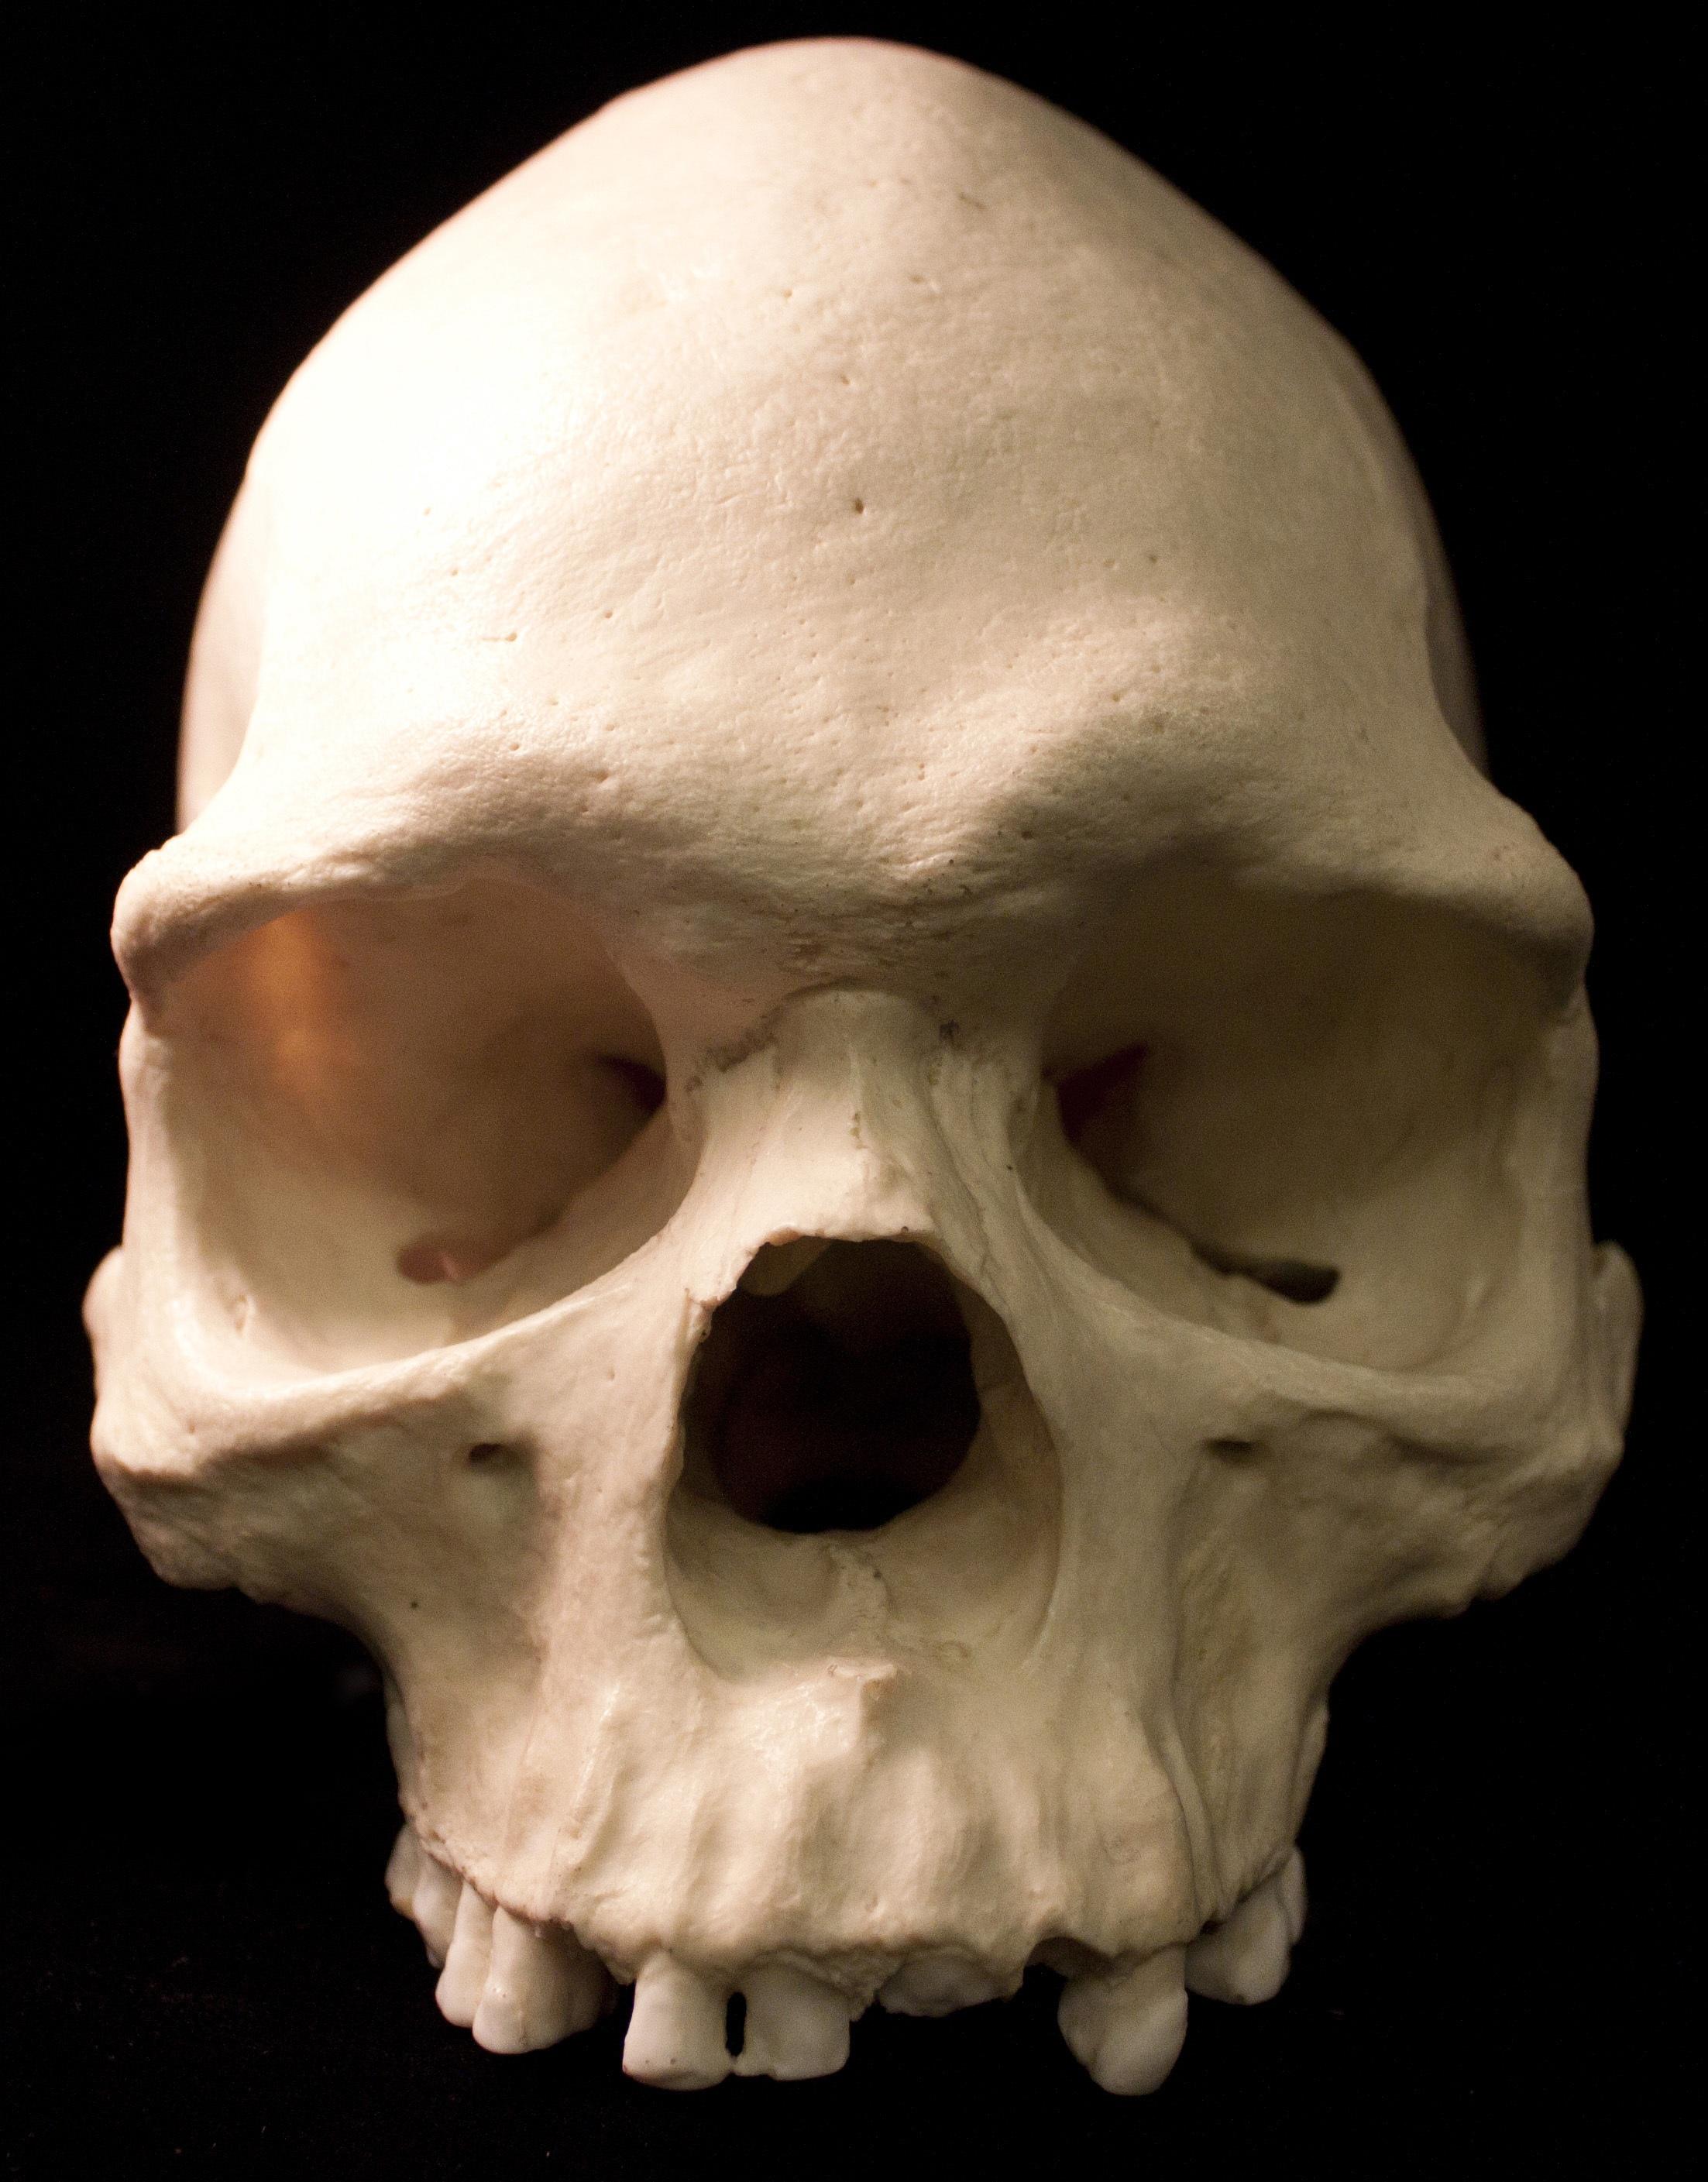 Free Images Clothing Death Skull Bone Face Sculpture Nose